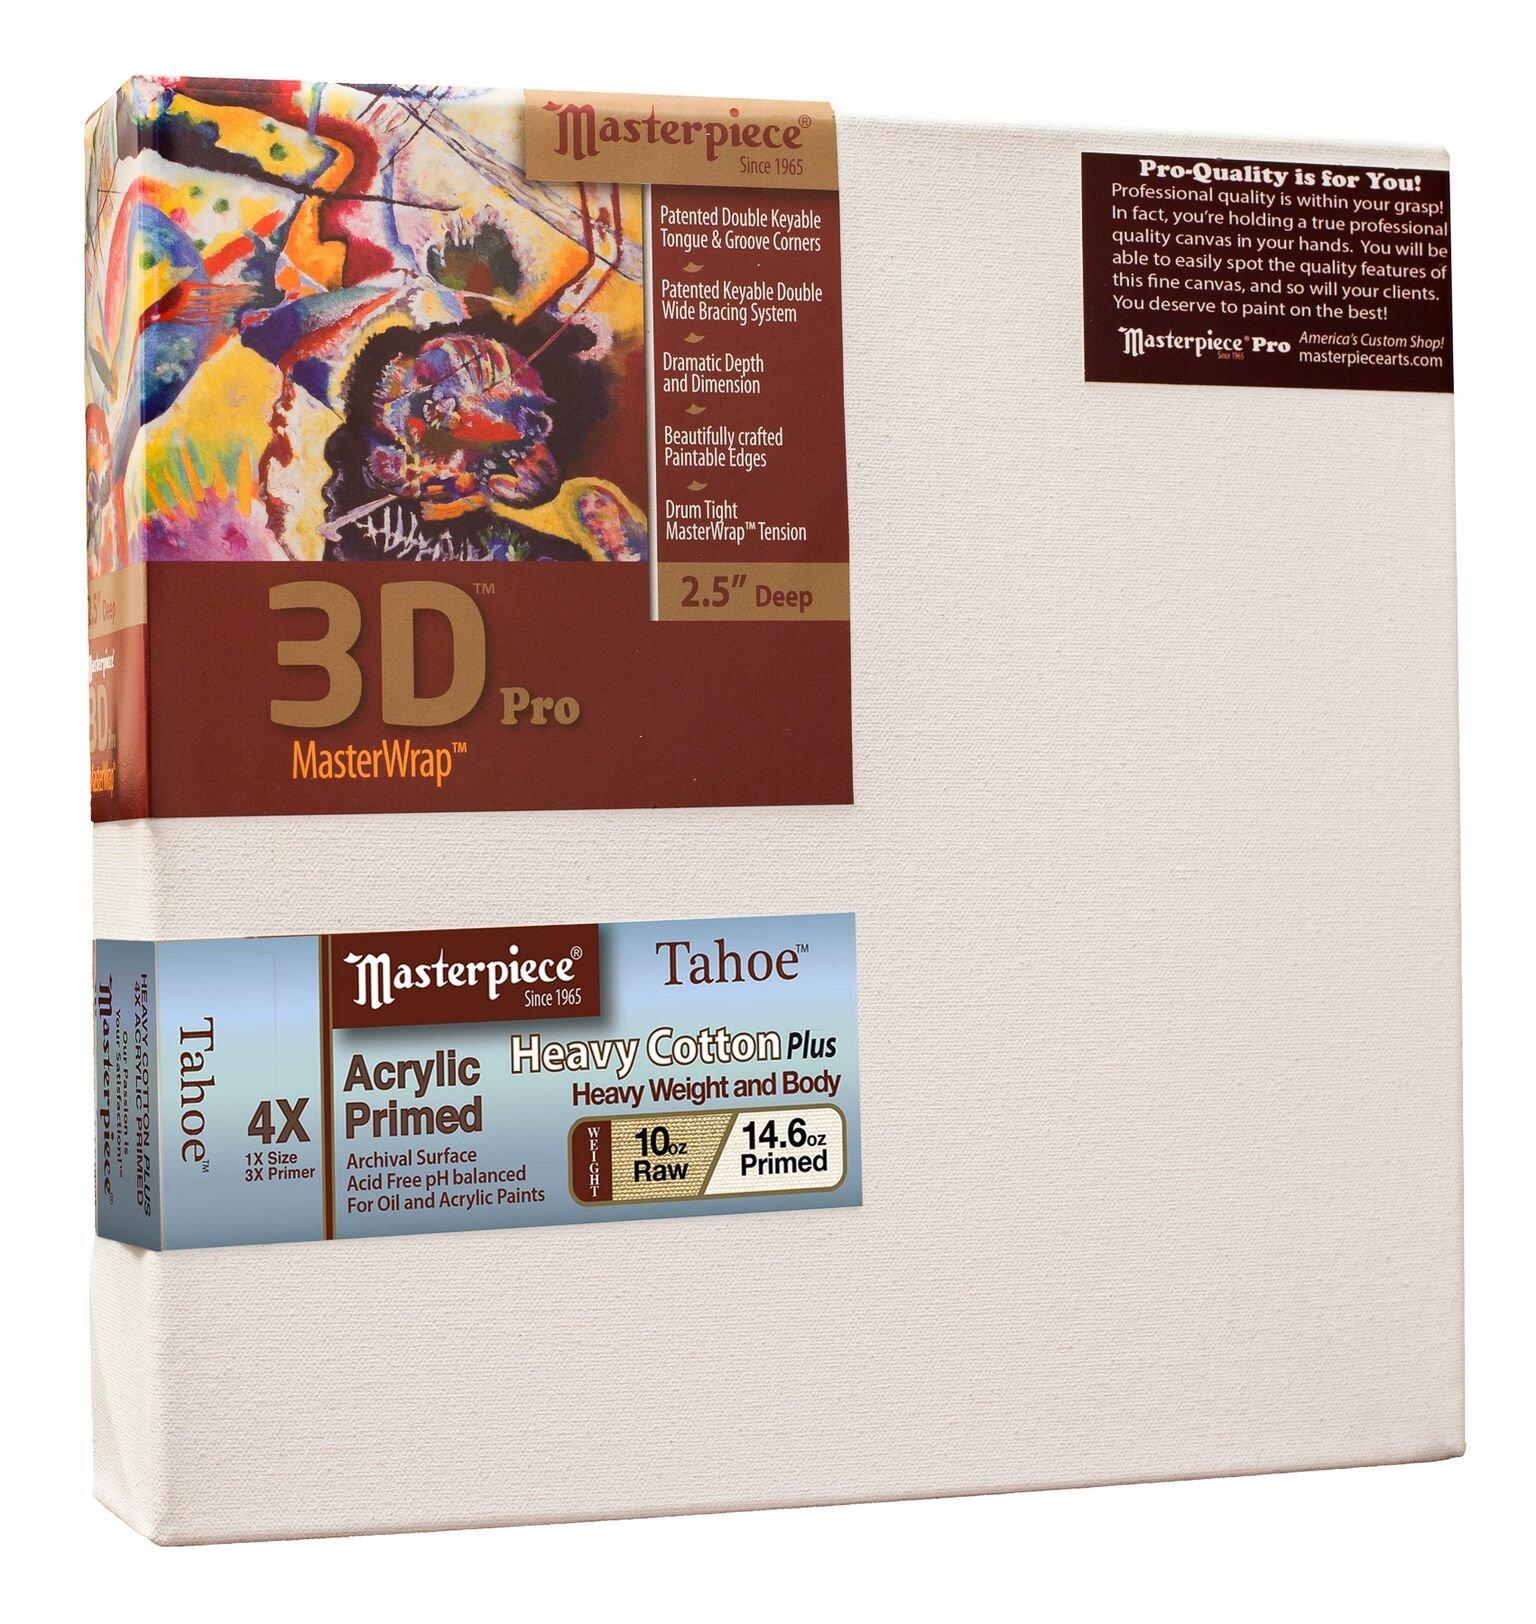 Masterpiece Artist Canvas 45593 3D Pro 2-1/2'' Deep, 54'' x 72'', Cotton 14.6oz - 4X - Tahoe Heavy Weight